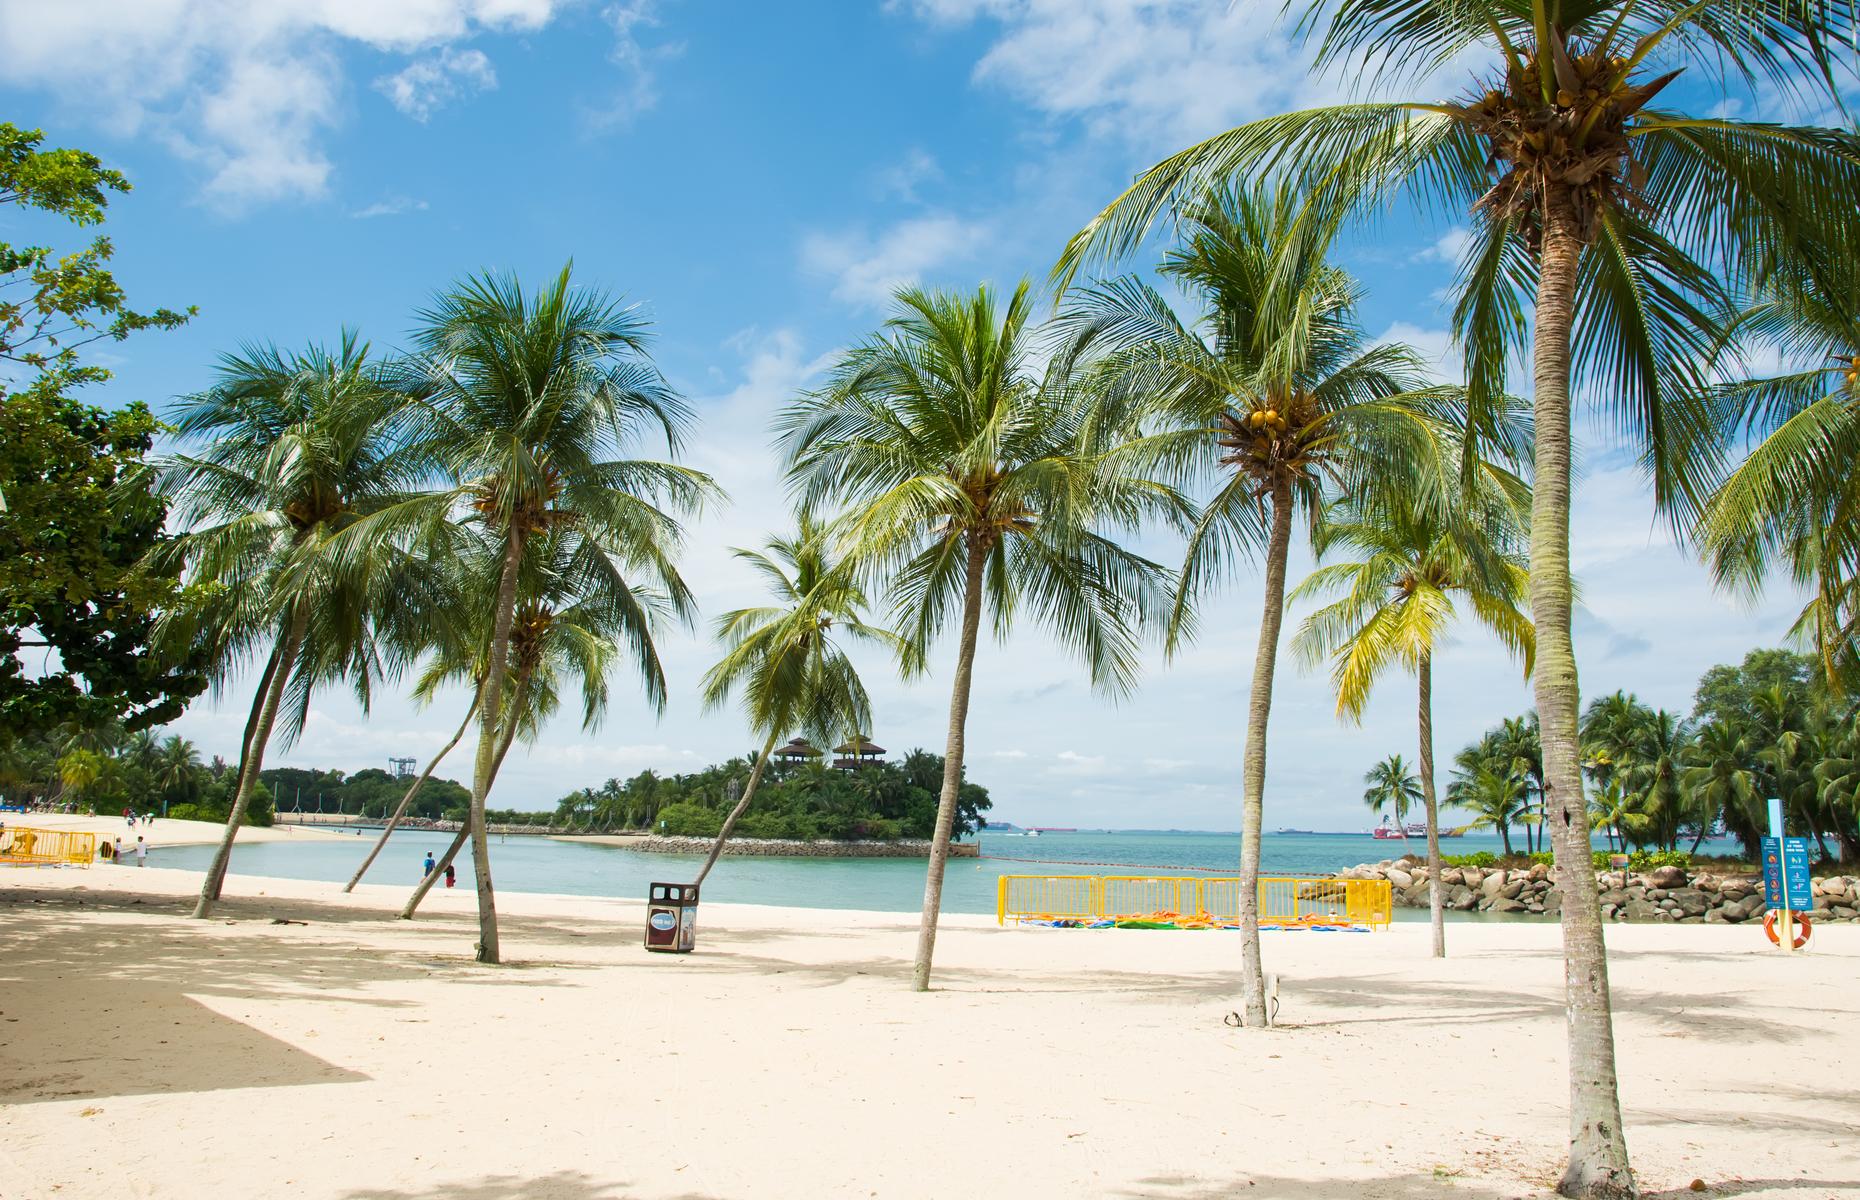 Palawan Beach on Sentosa Island